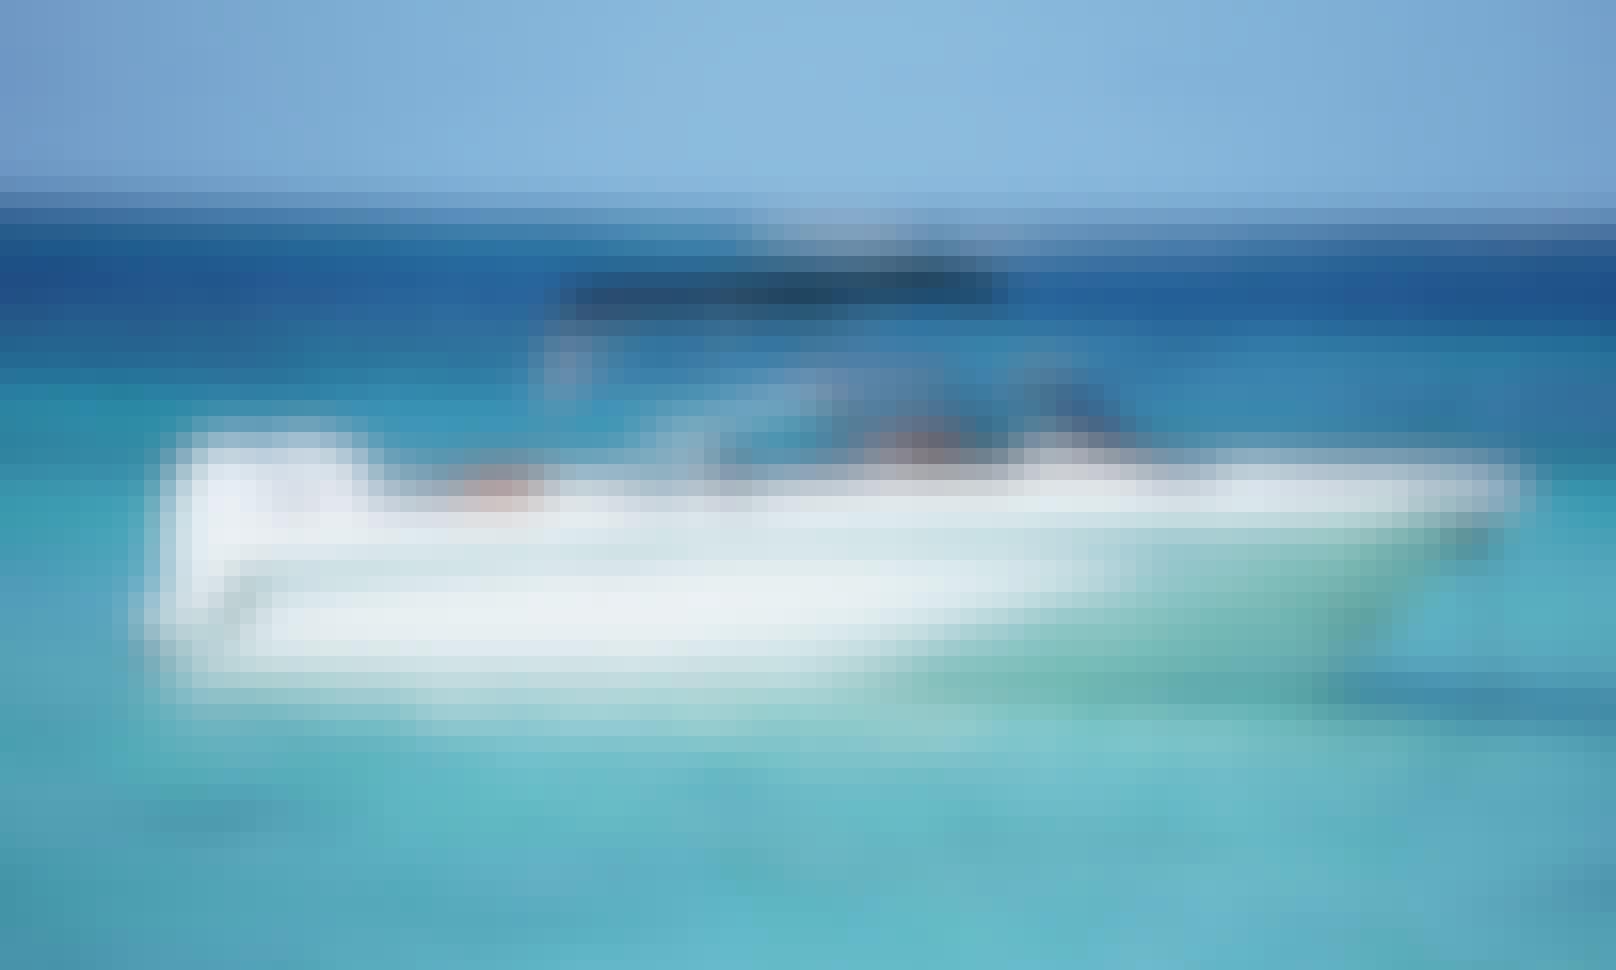 Boston Whaler Vantage 270 | Anguilla Boat Charter |